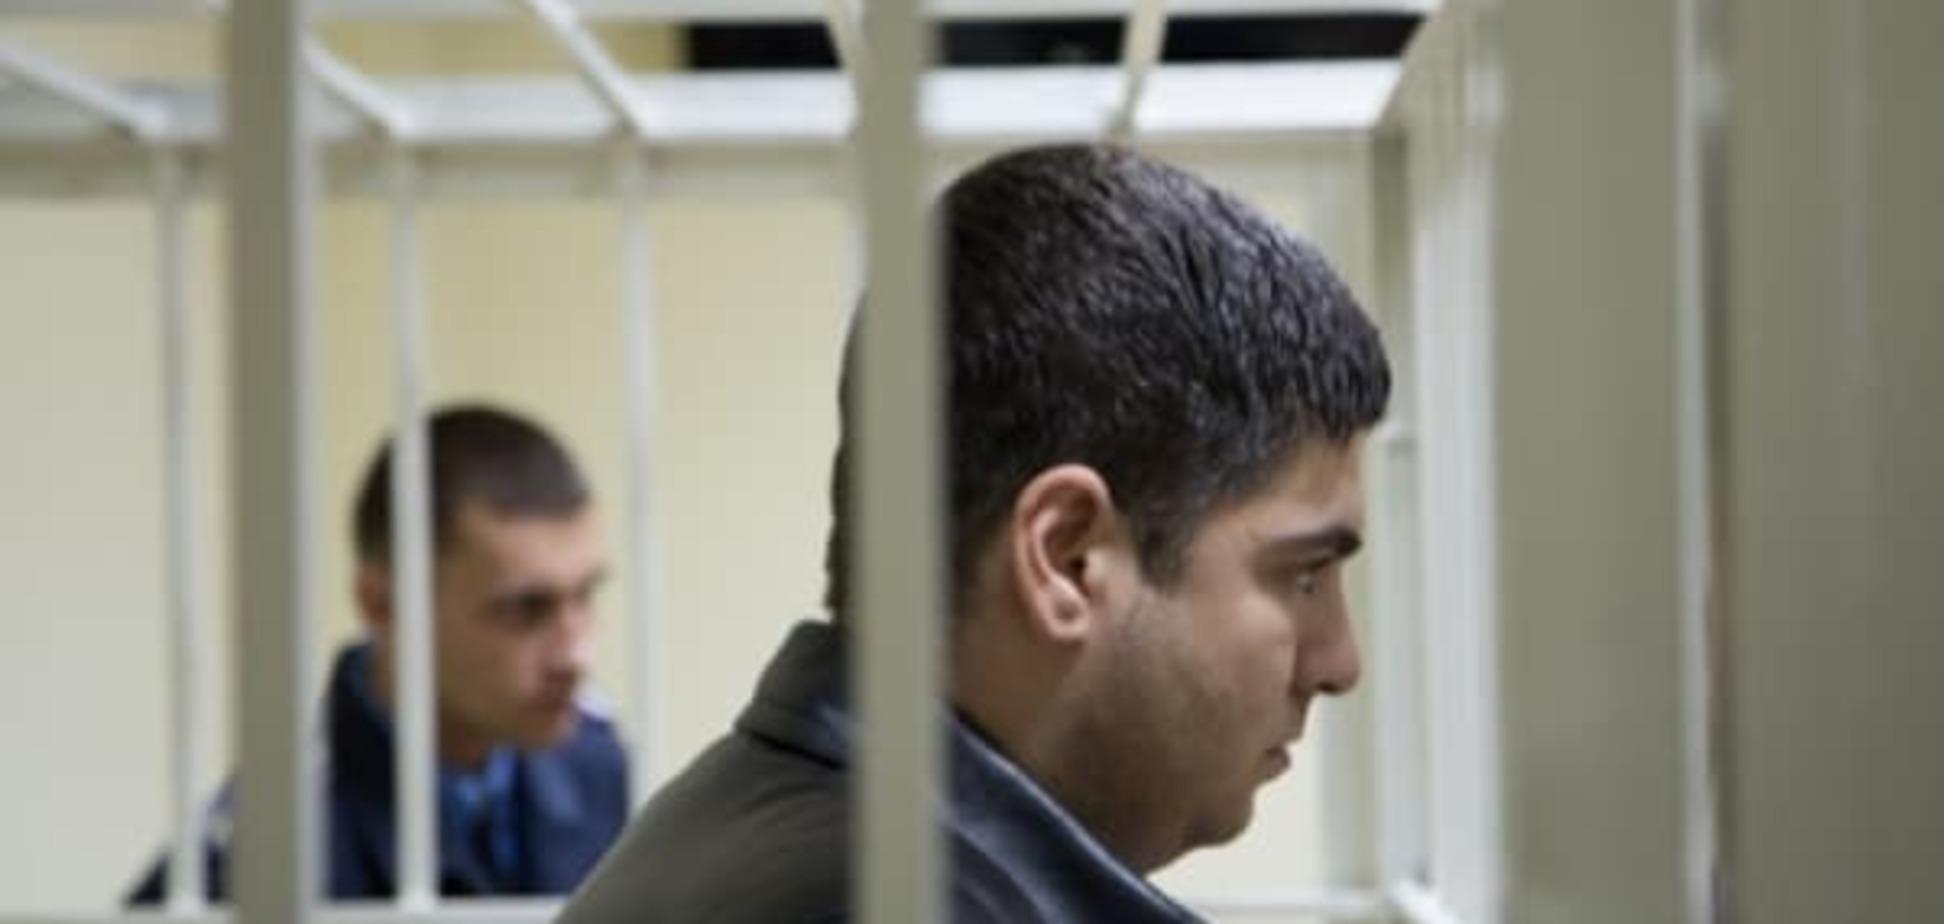 Суд на два месяца арестовал экс-пасынка Фирташа - Калиновского